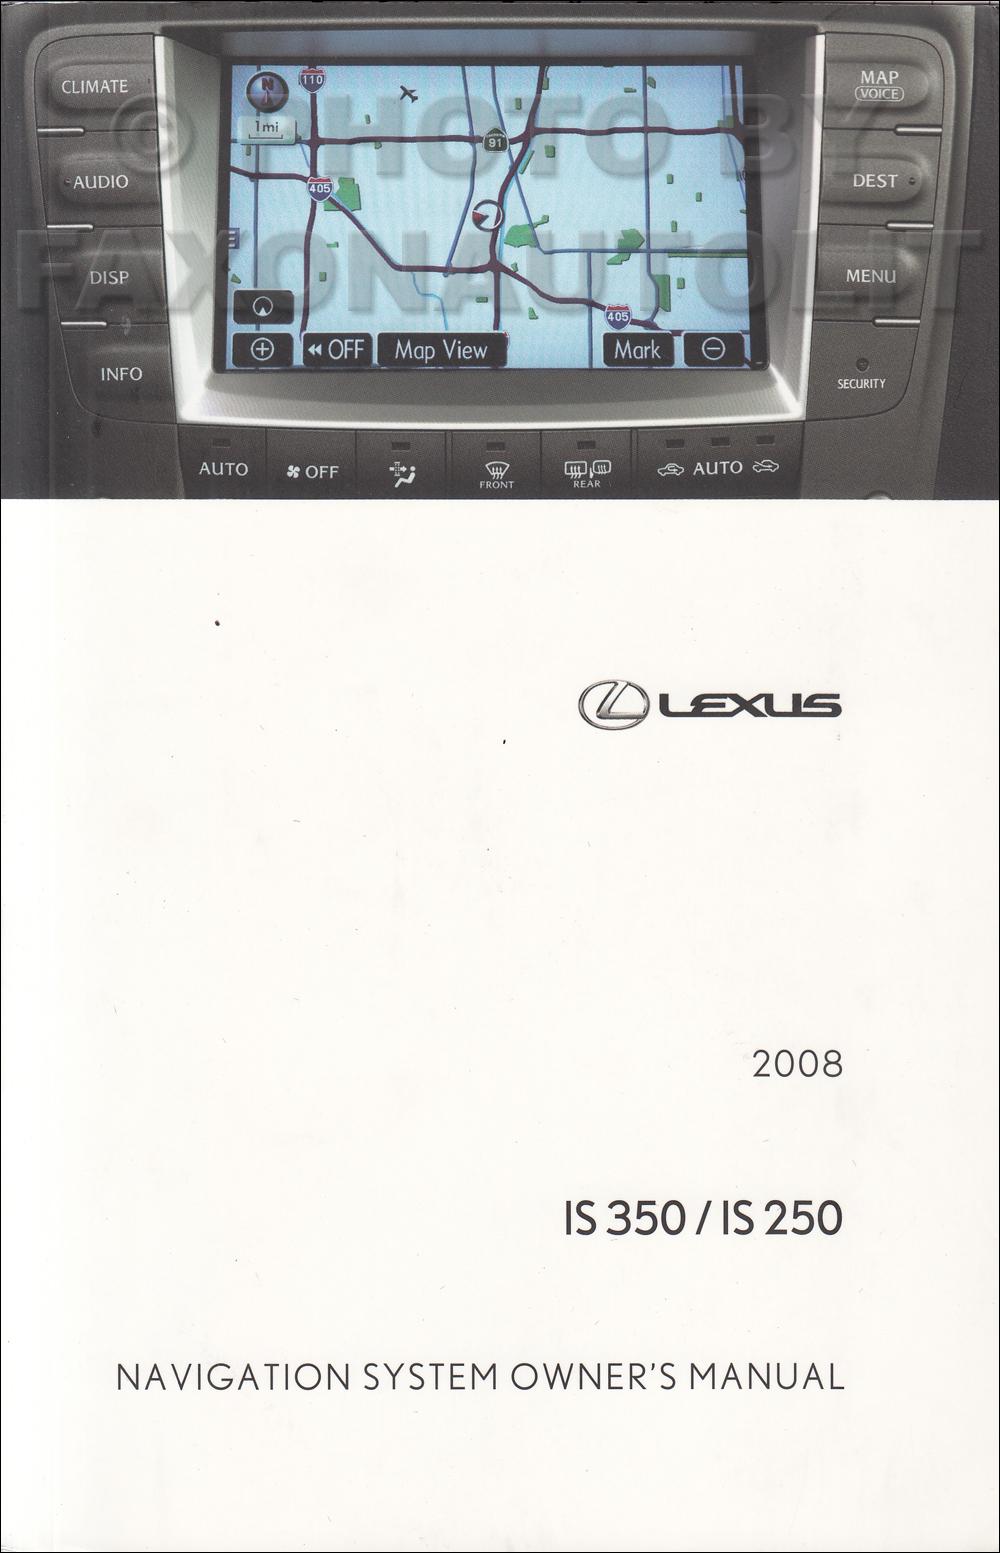 2011 lexus is250350 owners manual free owners manual u2022 rh wordworksbysea com lexus rx 450h navigation system manual lexus 450h navigation system manual